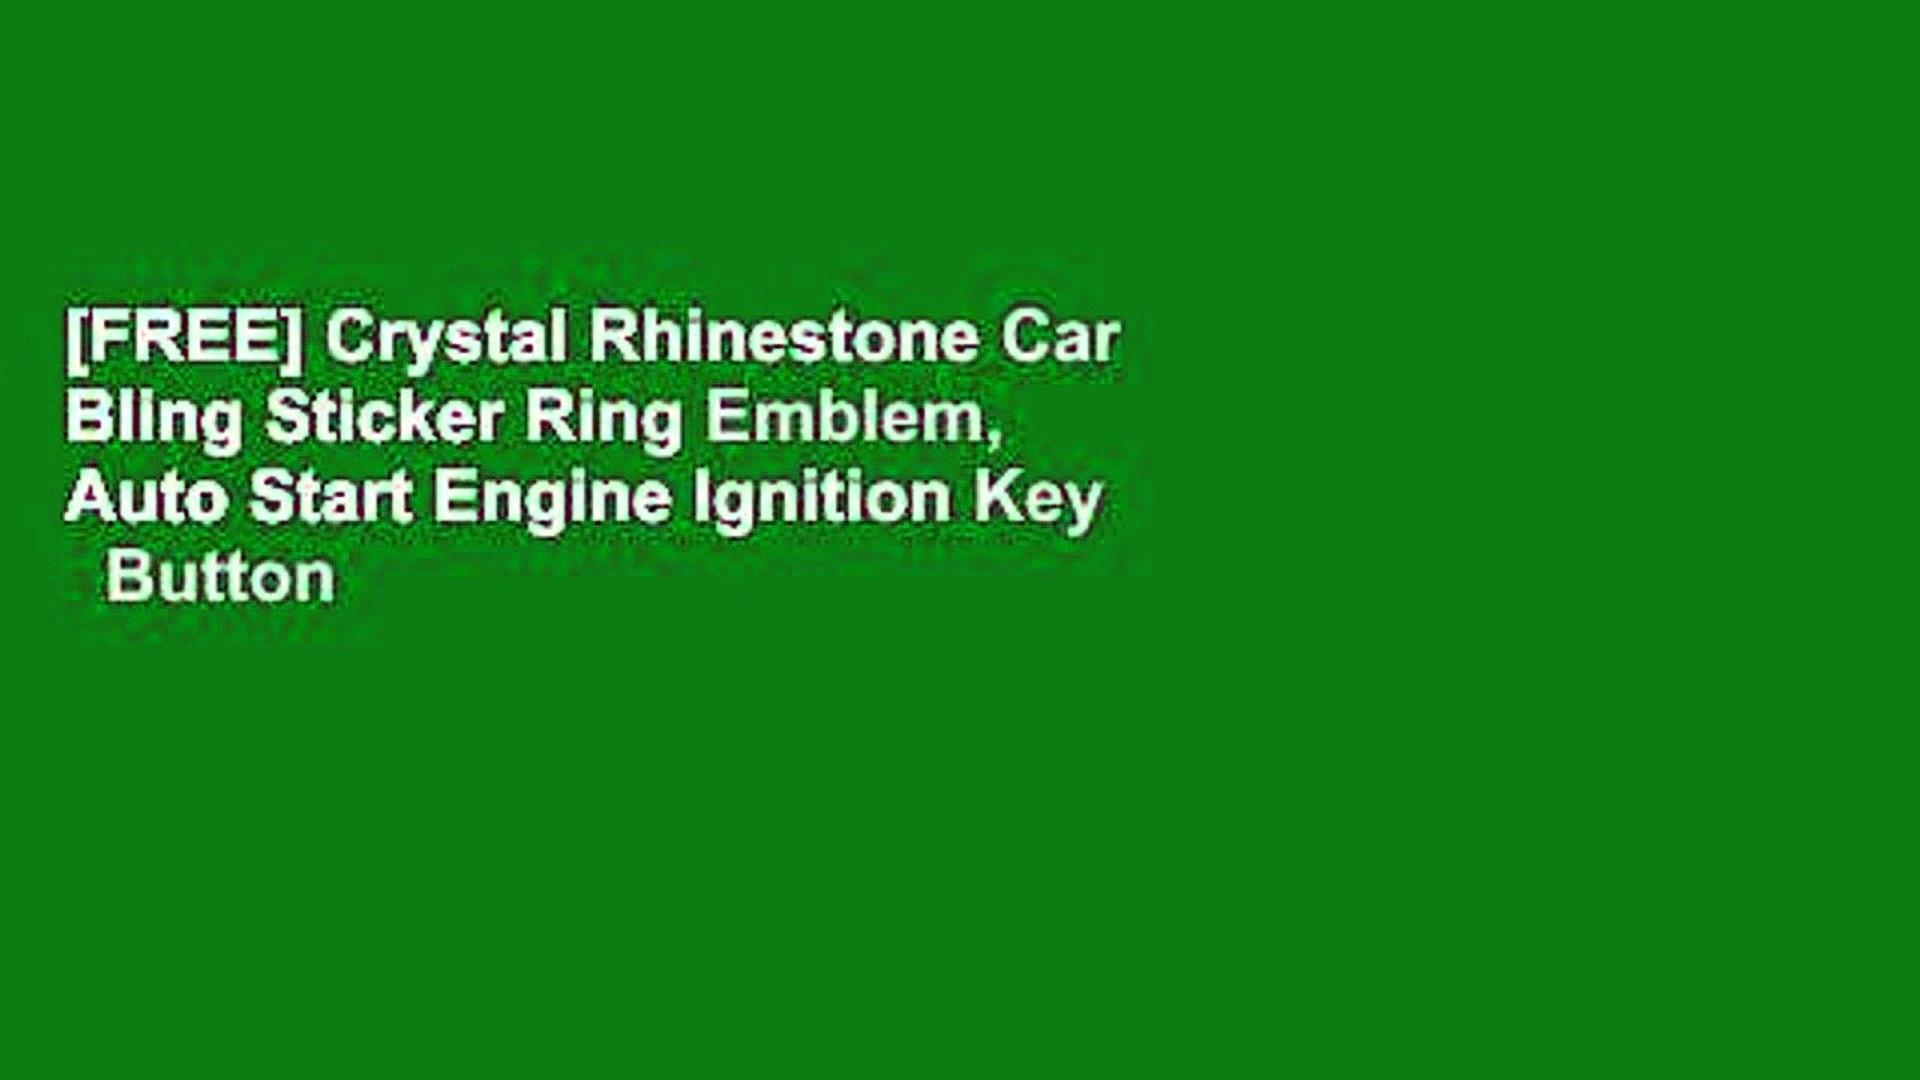 Free Crystal Rhinestone Car Bling Sticker Ring Emblem Auto Start Engine Ignition Key Button